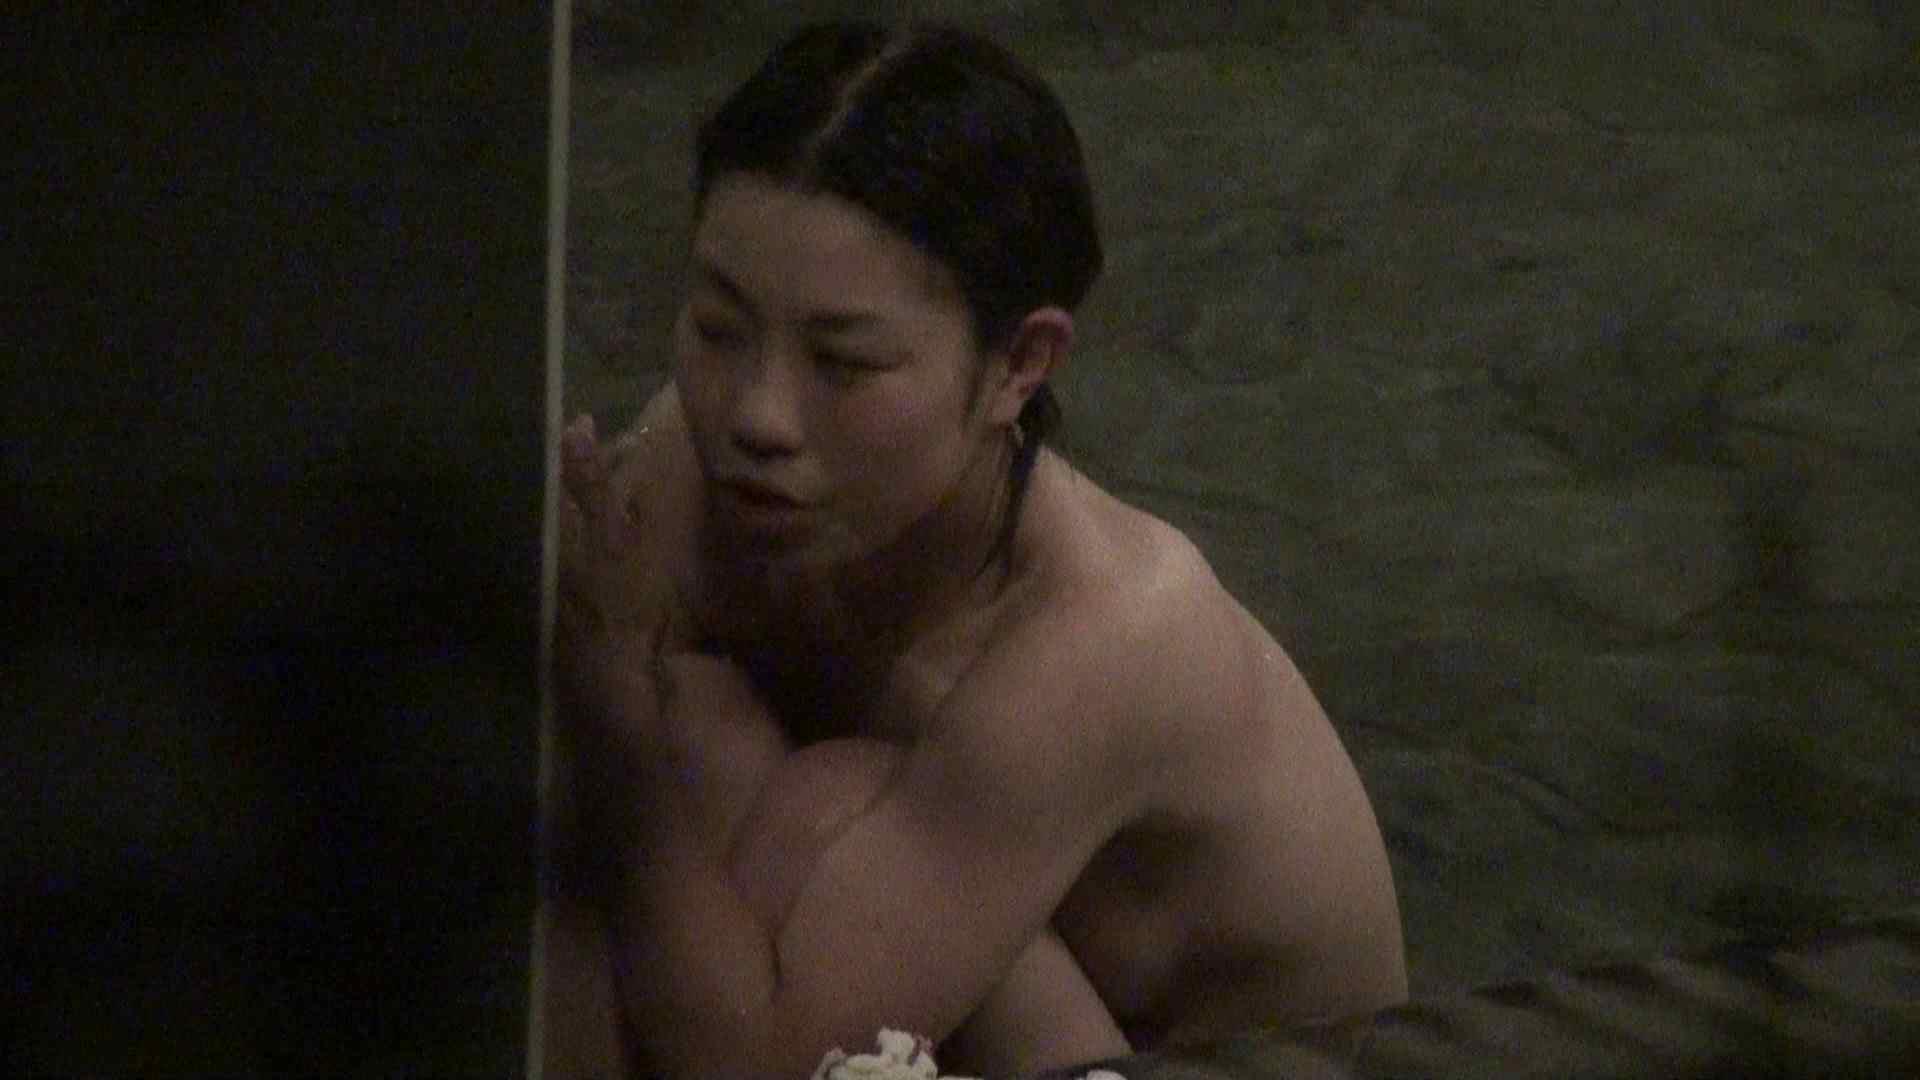 Aquaな露天風呂Vol.330 盗撮   HなOL  83pic 59